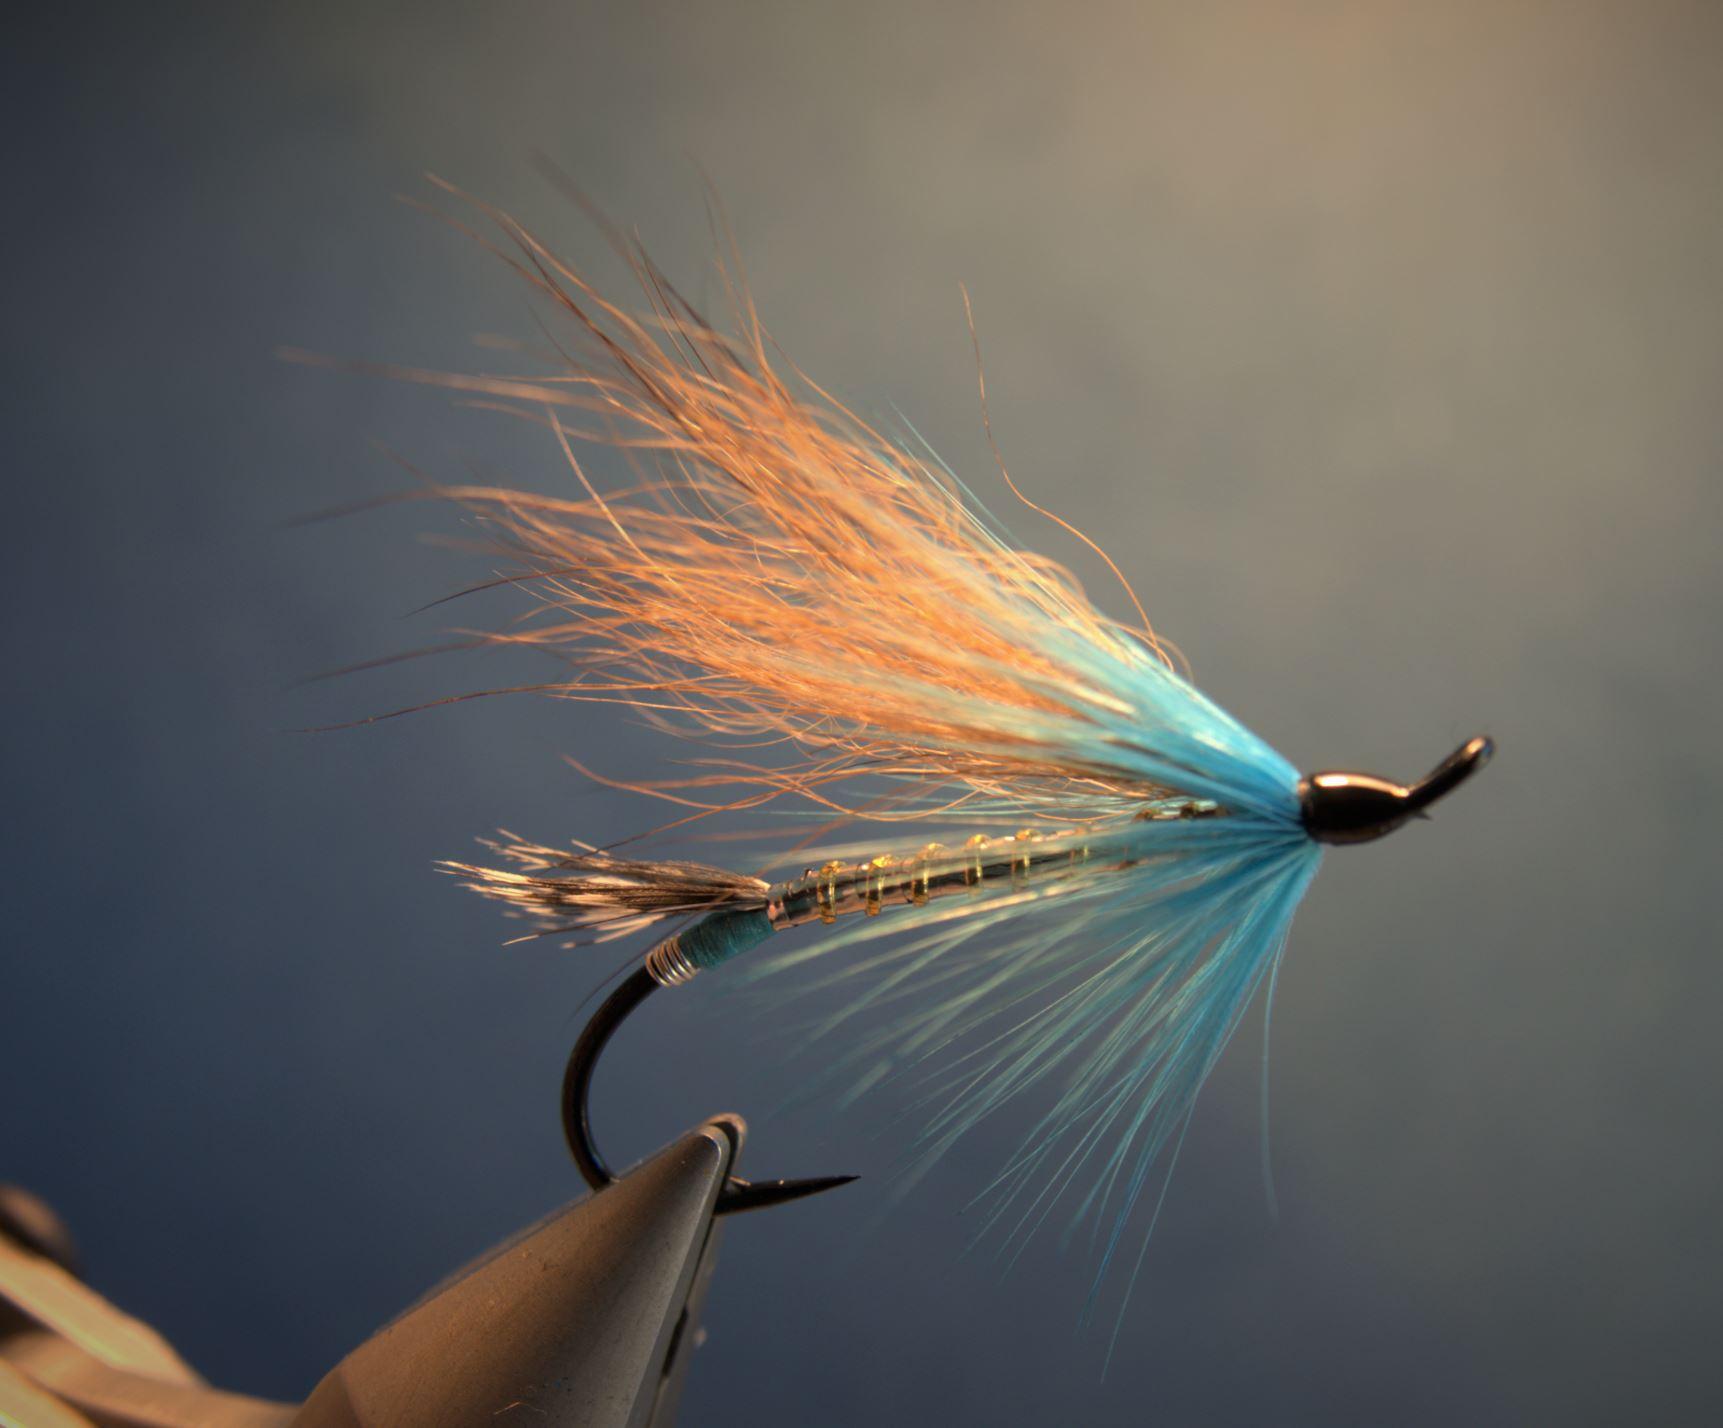 Blue Reynard renard fly tying flytying mouche eclosion fur poil saumon salmon seatrout truite de mer